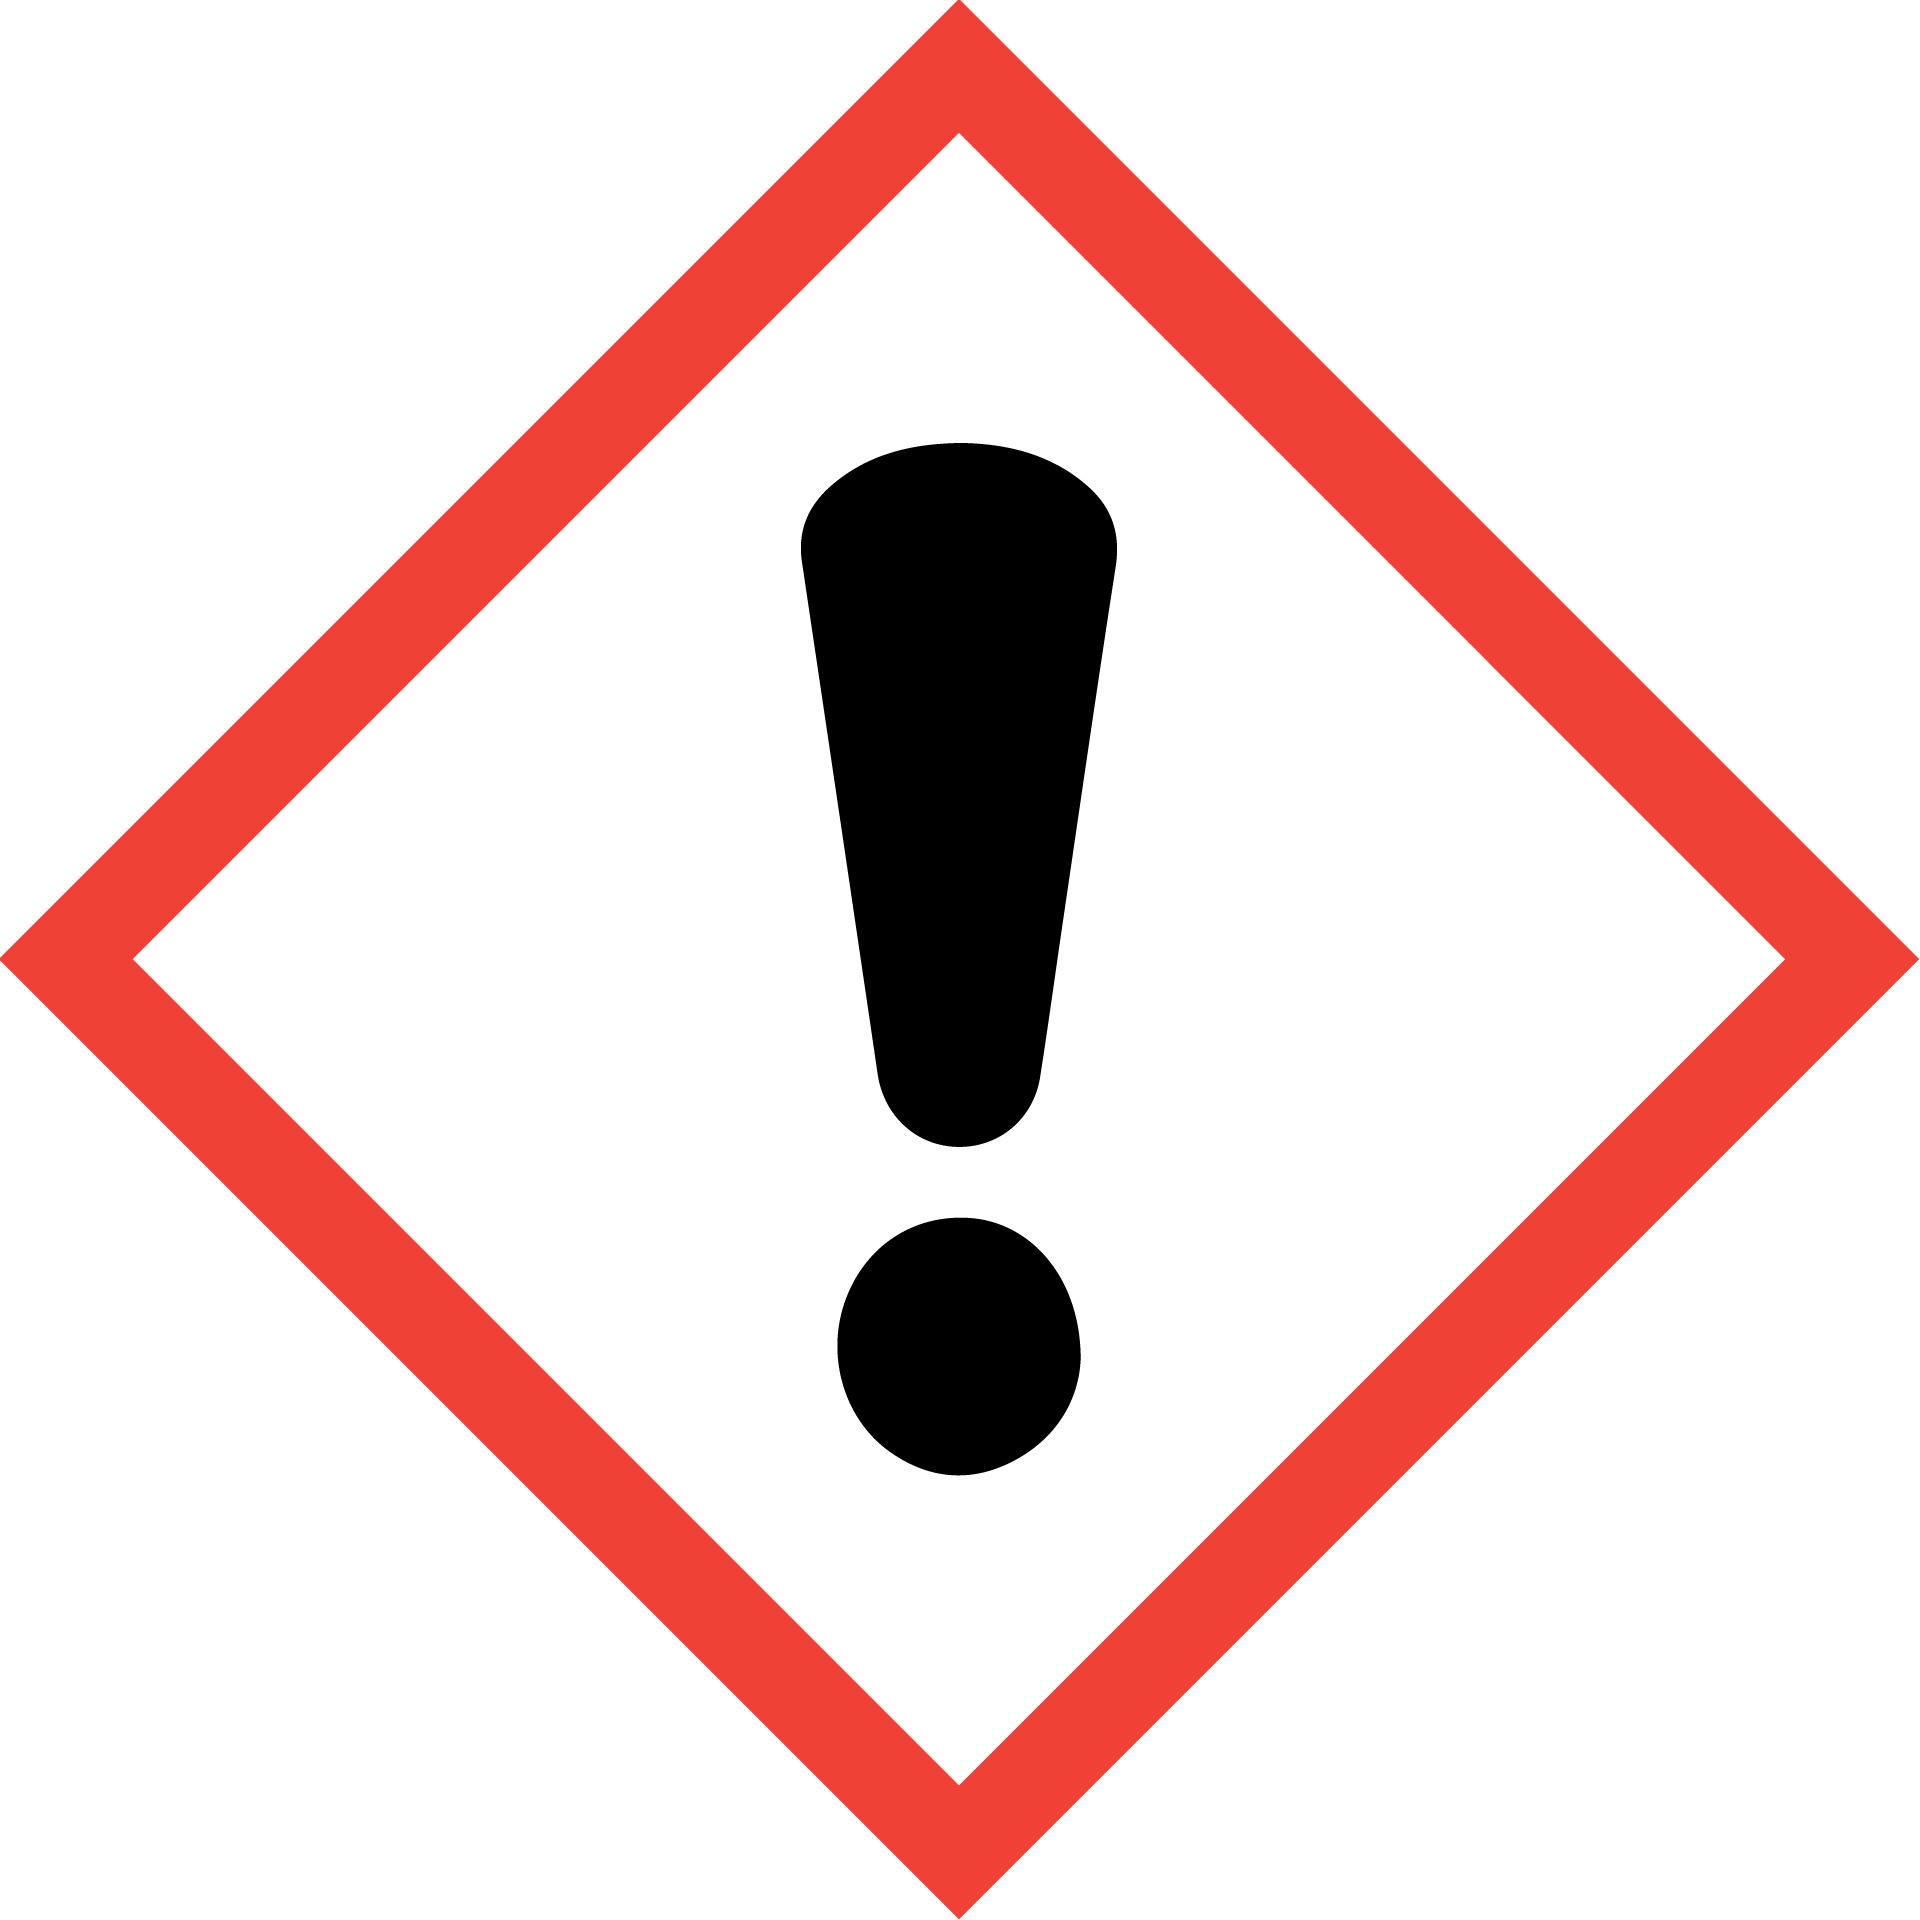 Toxic warning symbol pencil. Caution clipart mark